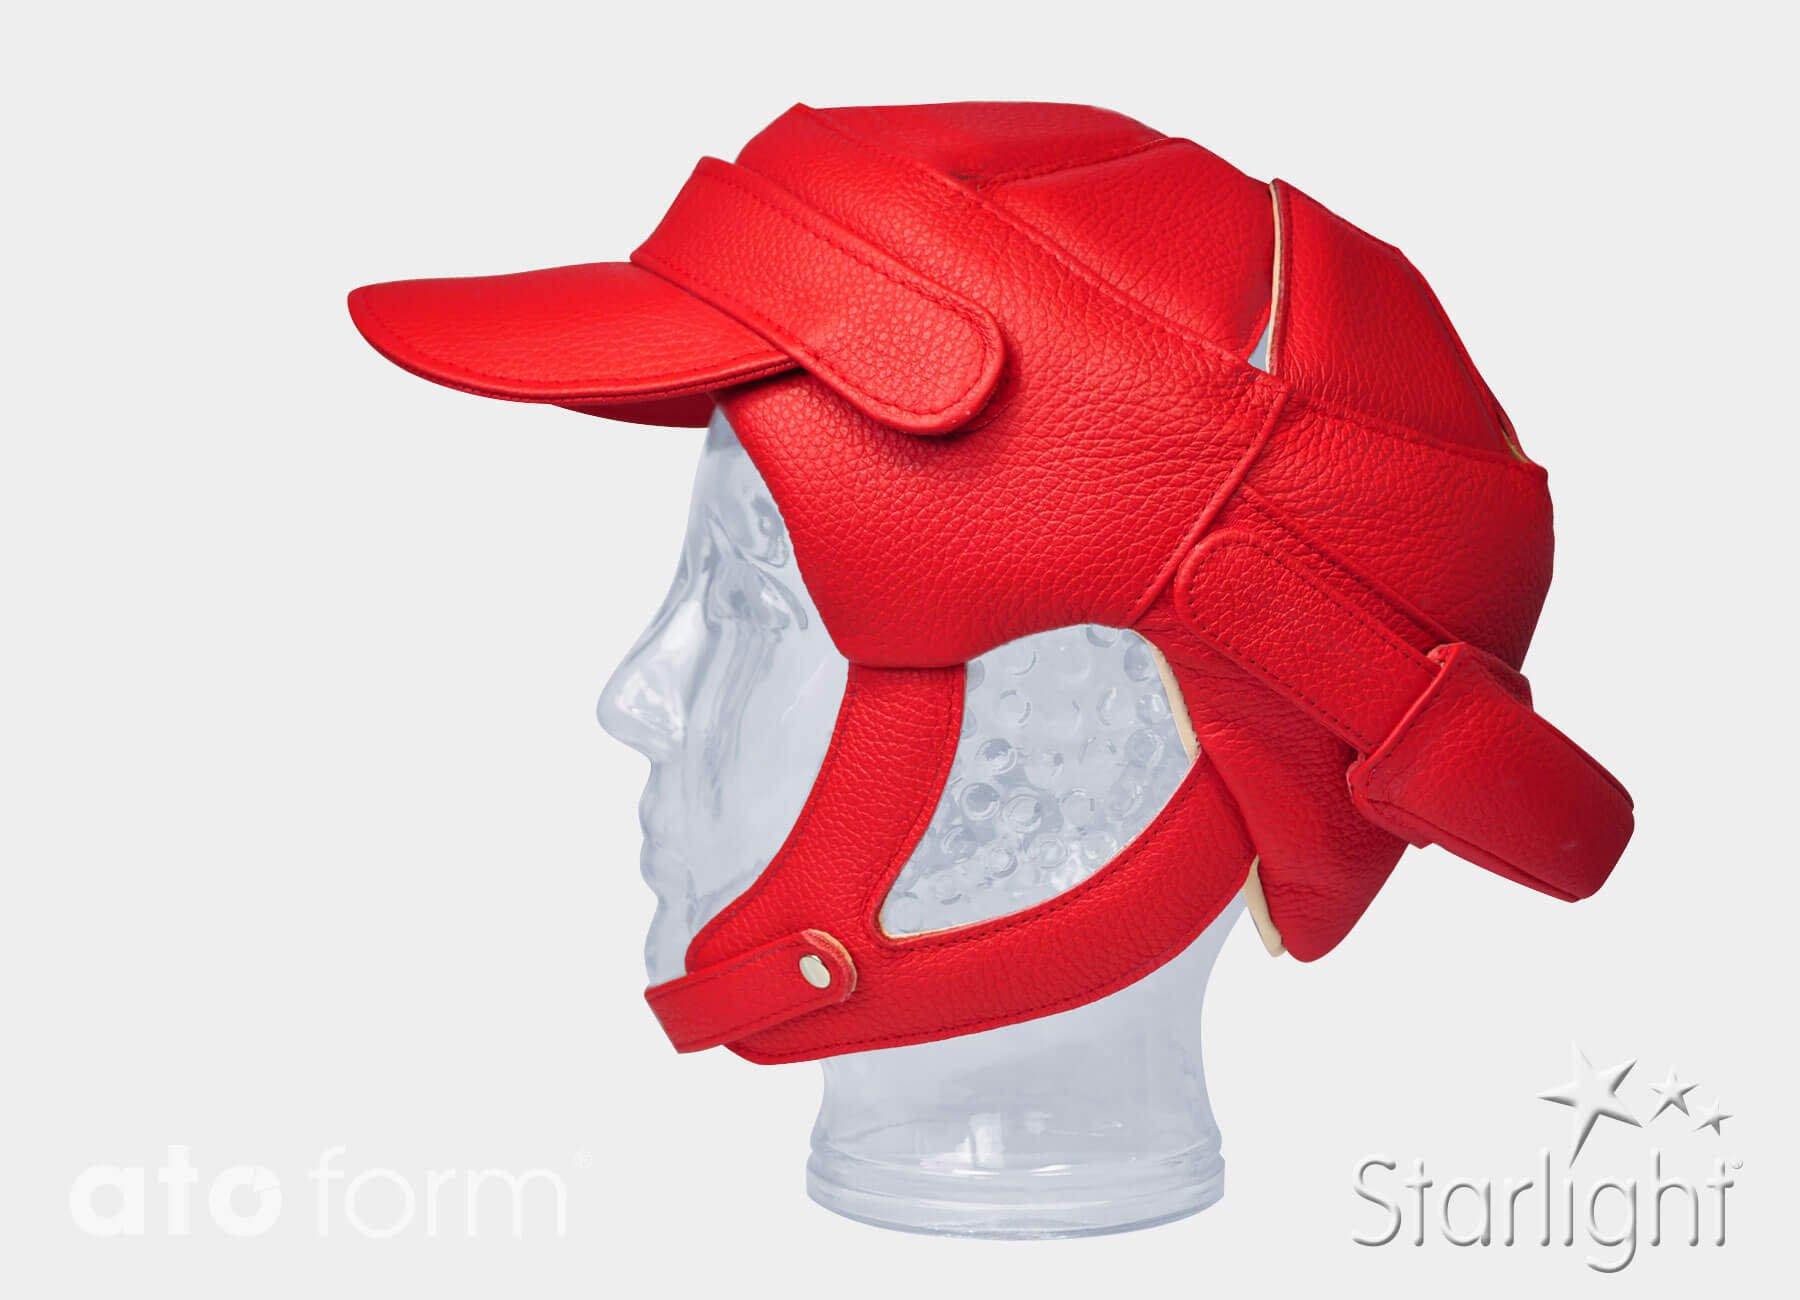 Starlight Secure Farbvariante